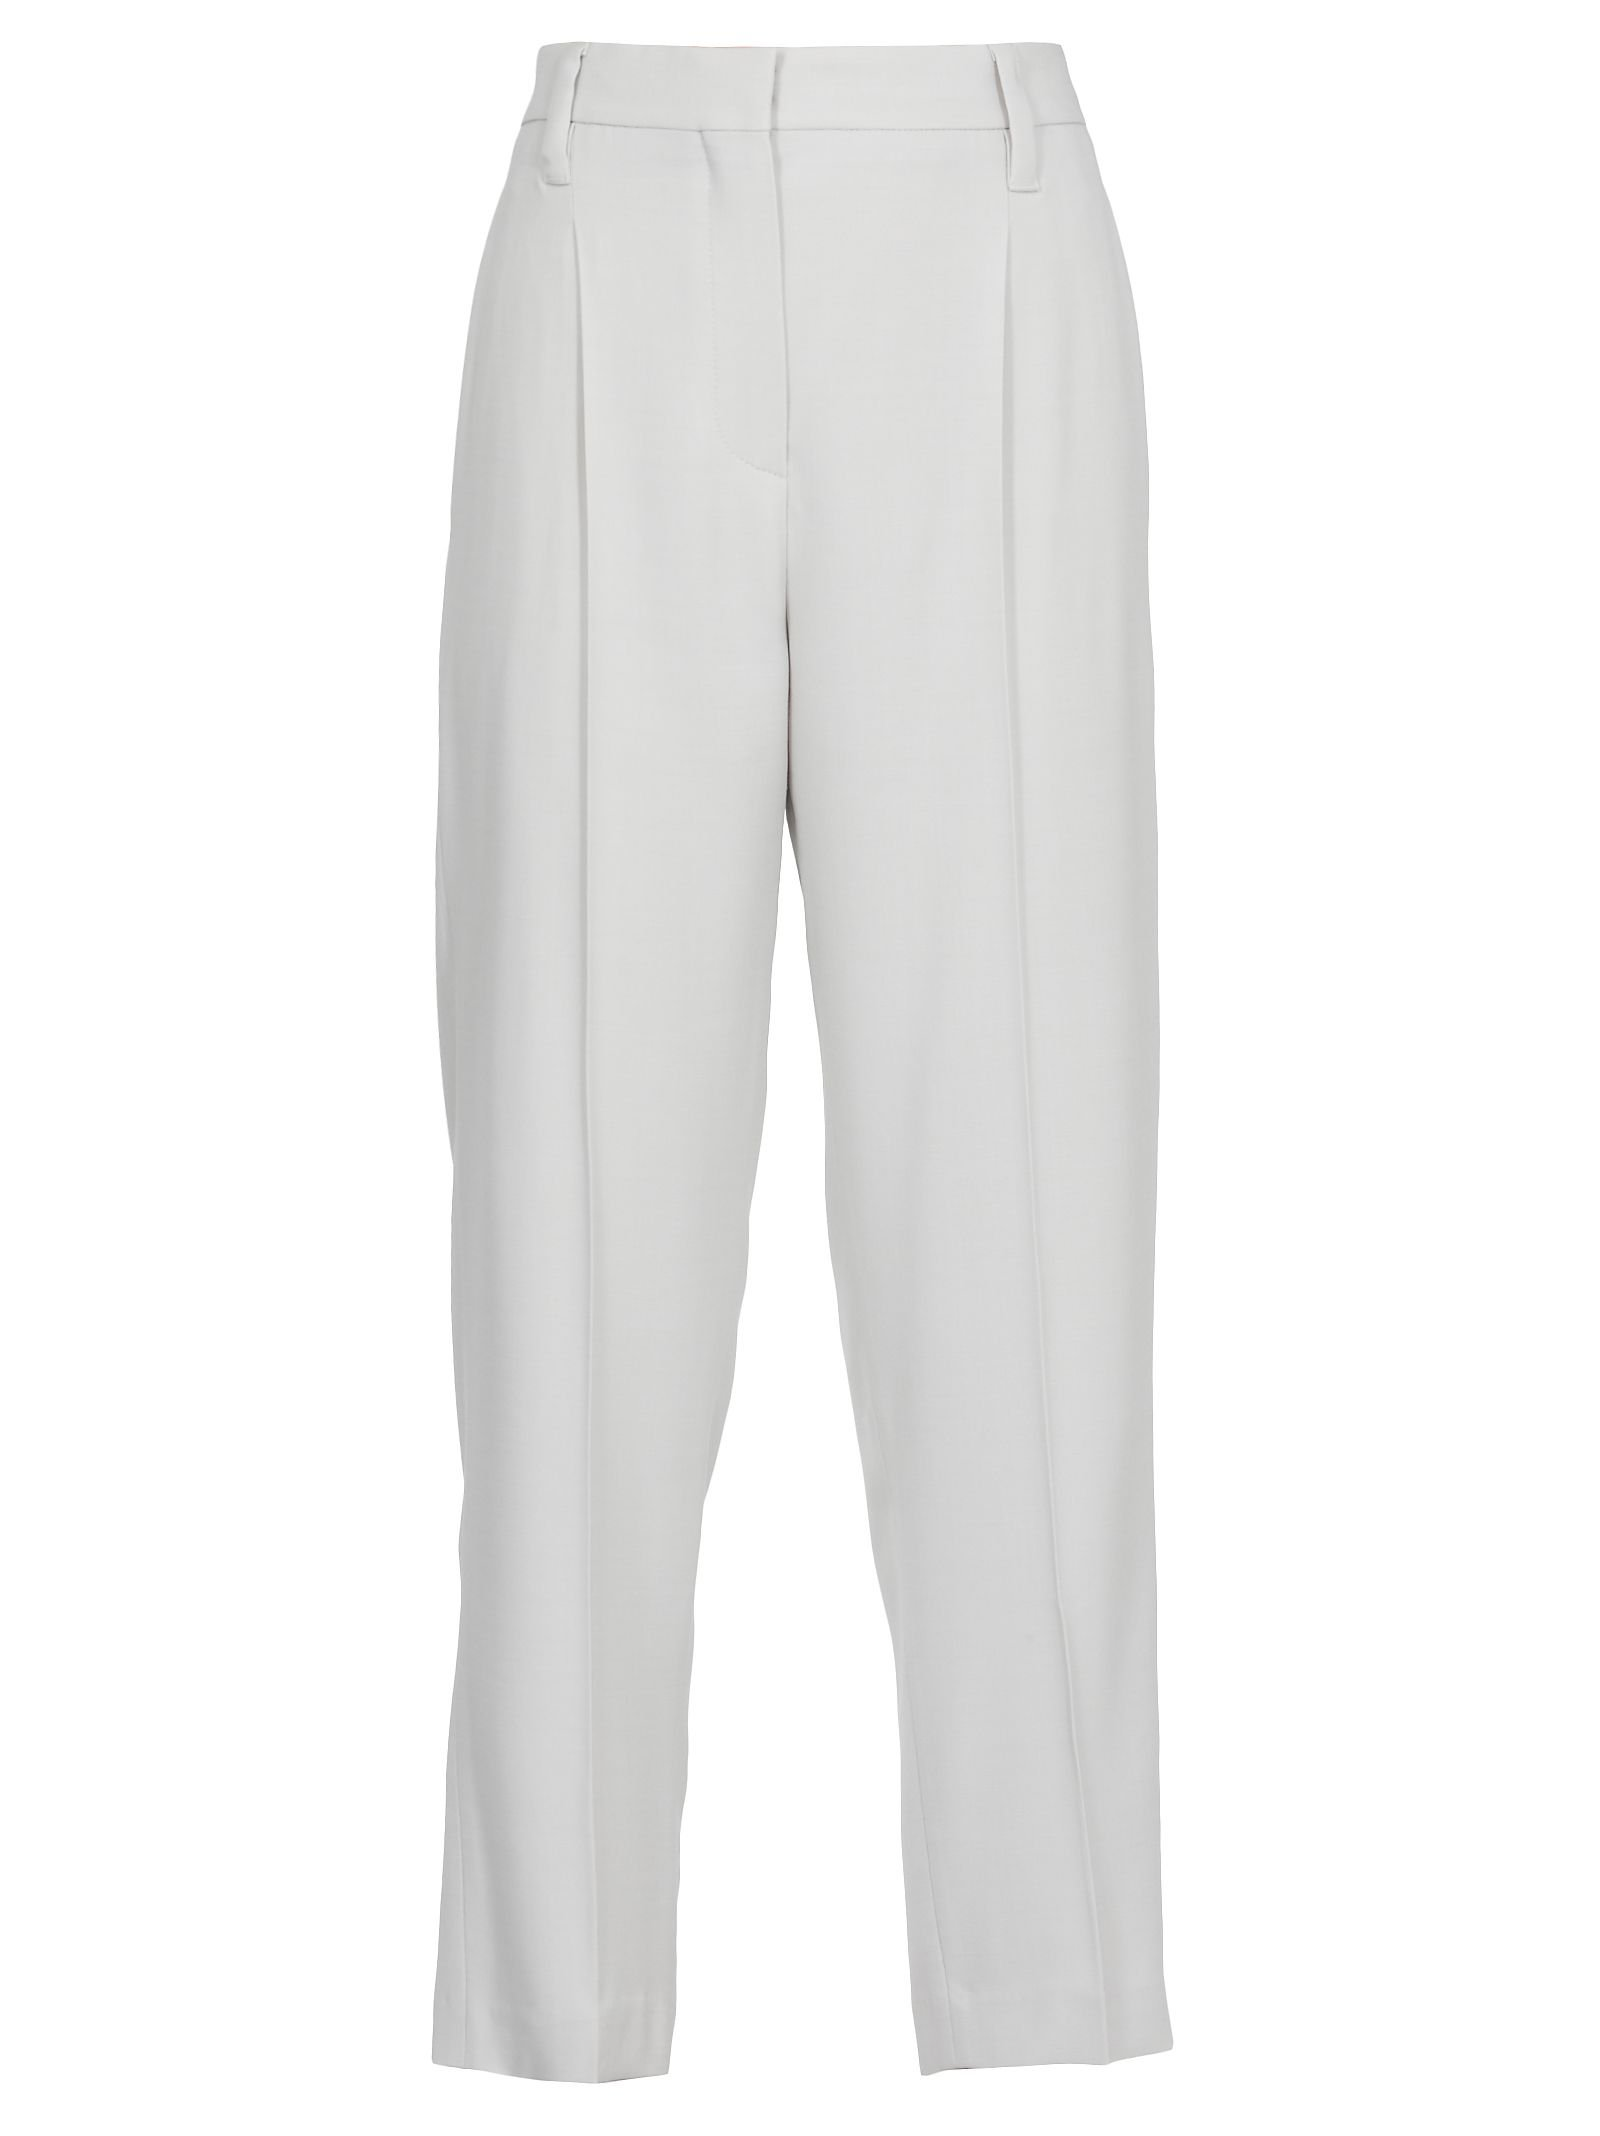 Brunello Cucinelli Wool Blend Trousers